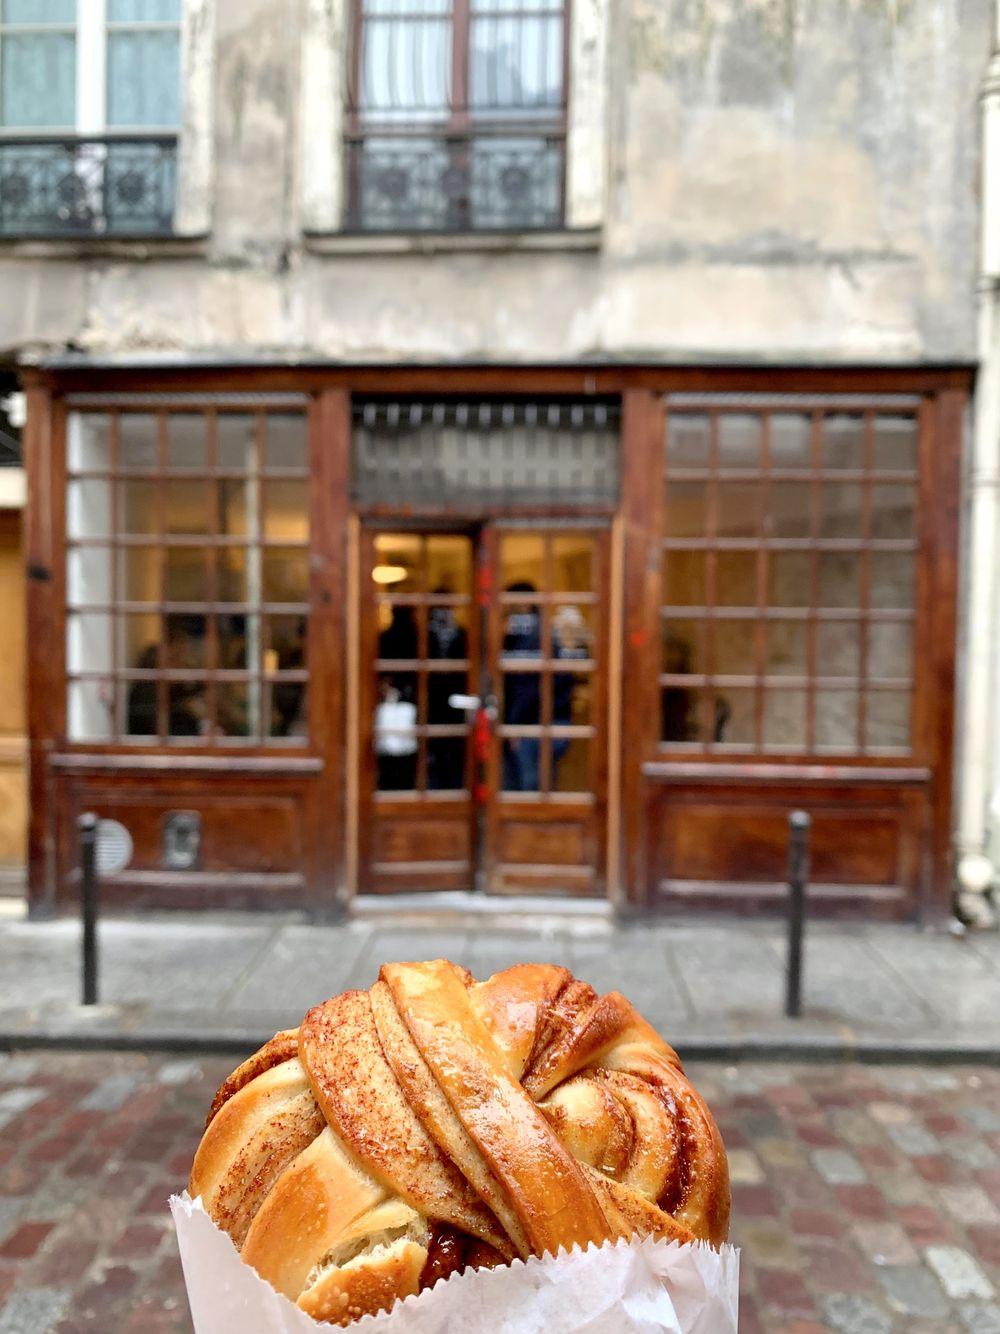 Circus Bakery Cinnamon Rolls, Paris